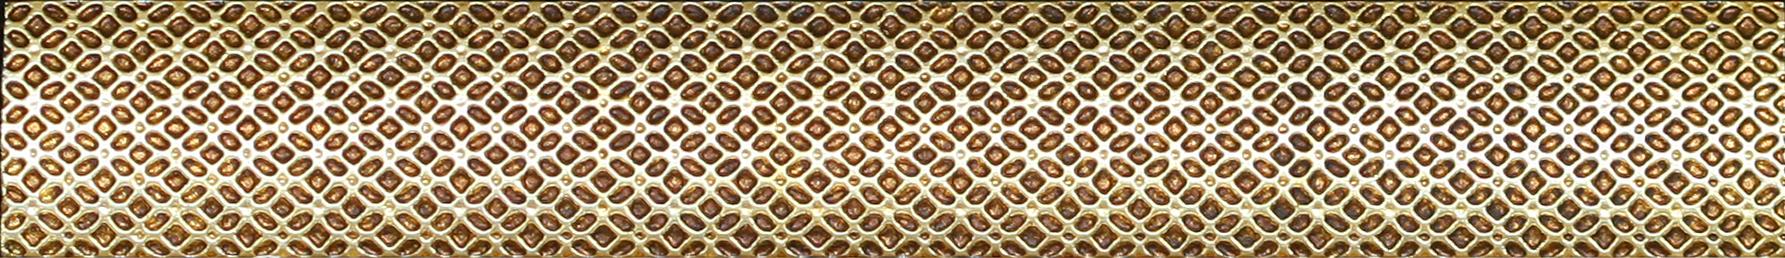 Бордюр Aparici +13283 SYMBOL GOLD MOLD бордюр blau versalles mold michelle 3 5x25